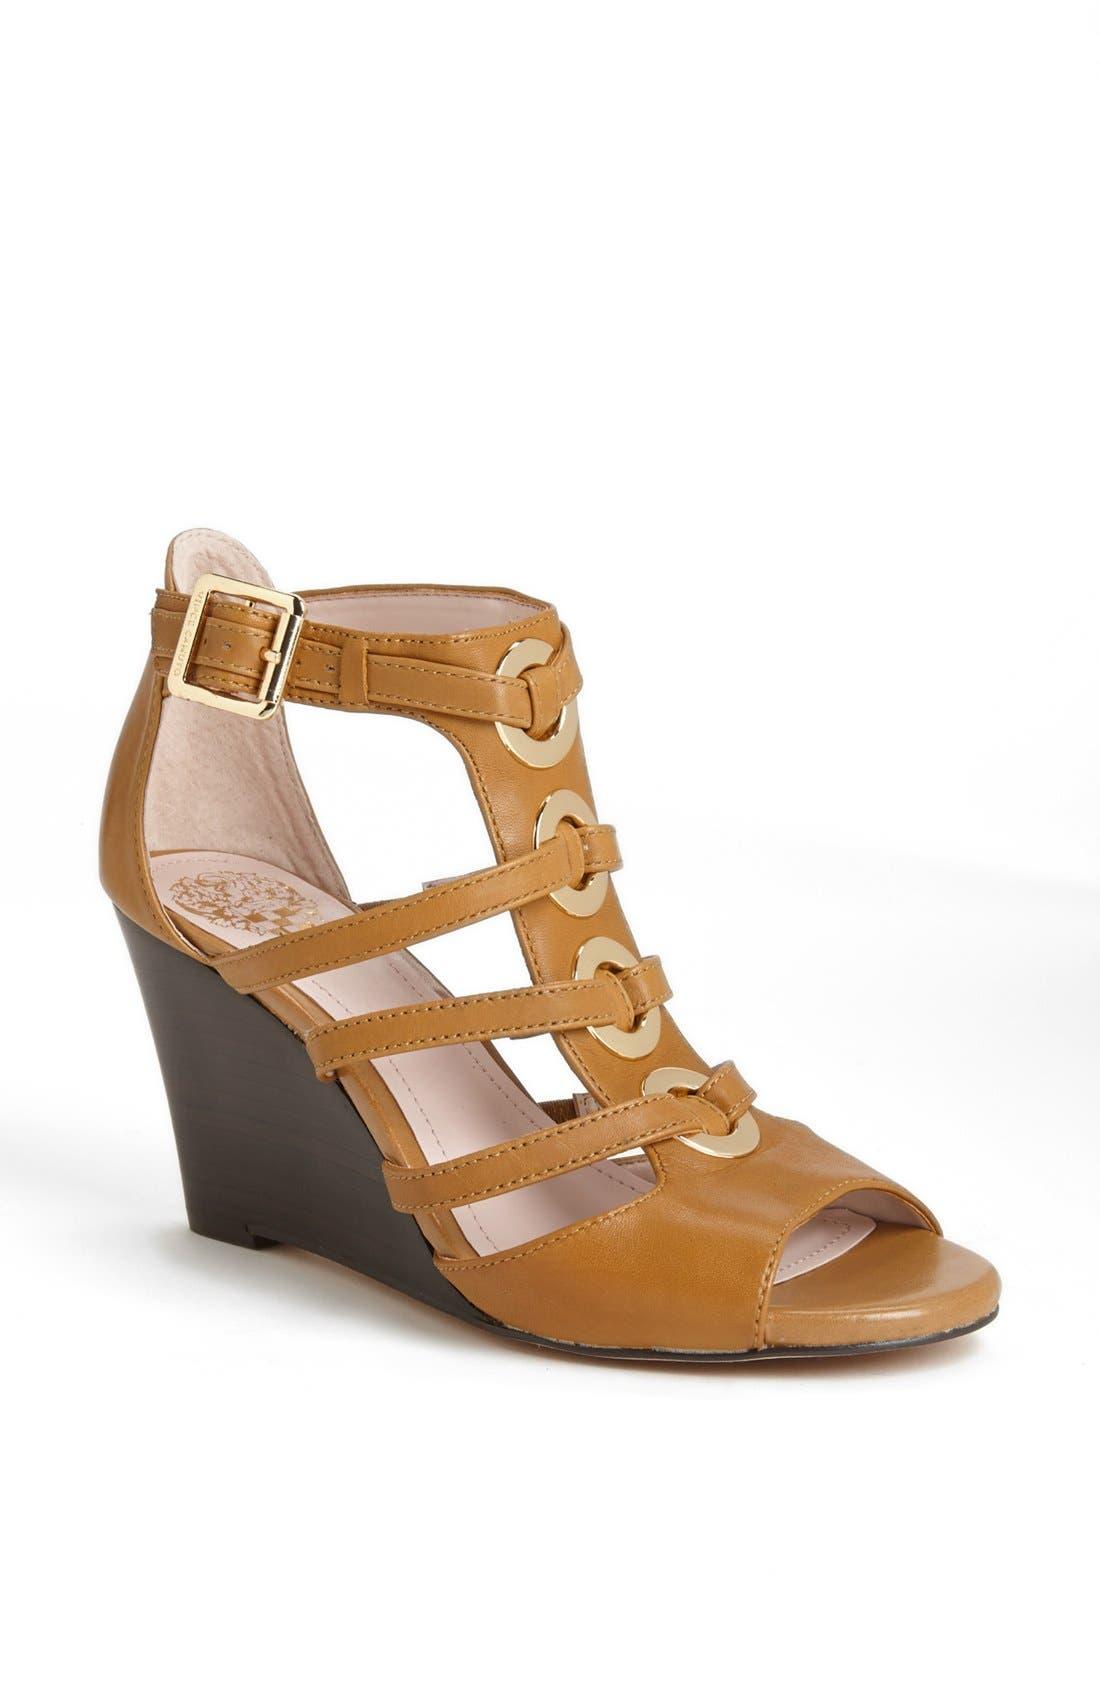 Alternate Image 1 Selected - Vince Camuto 'Huni' Sandal